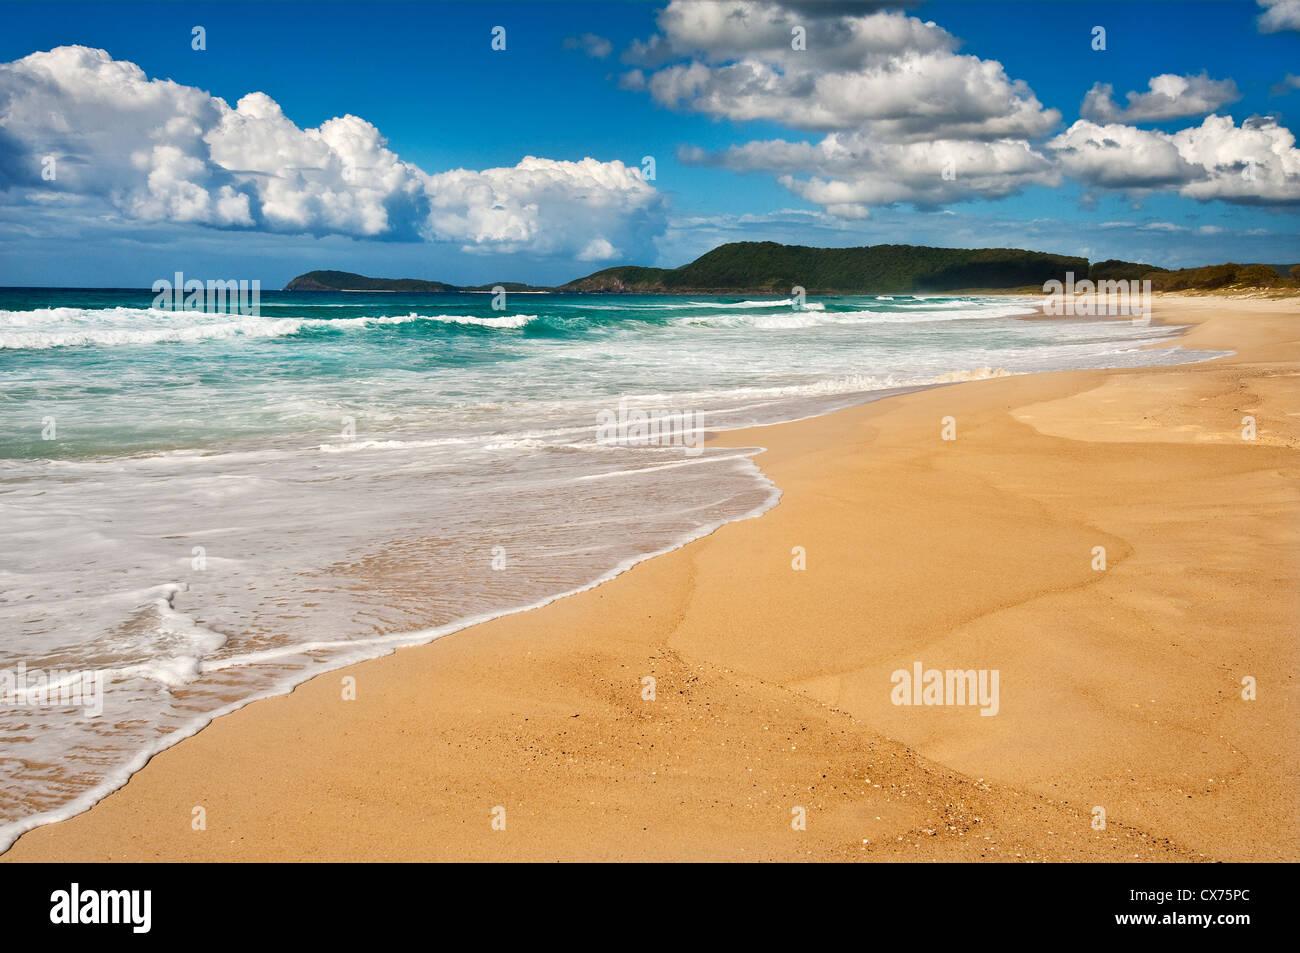 Pristine Seven Mile Beach in Booti Booti National Park. - Stock Image